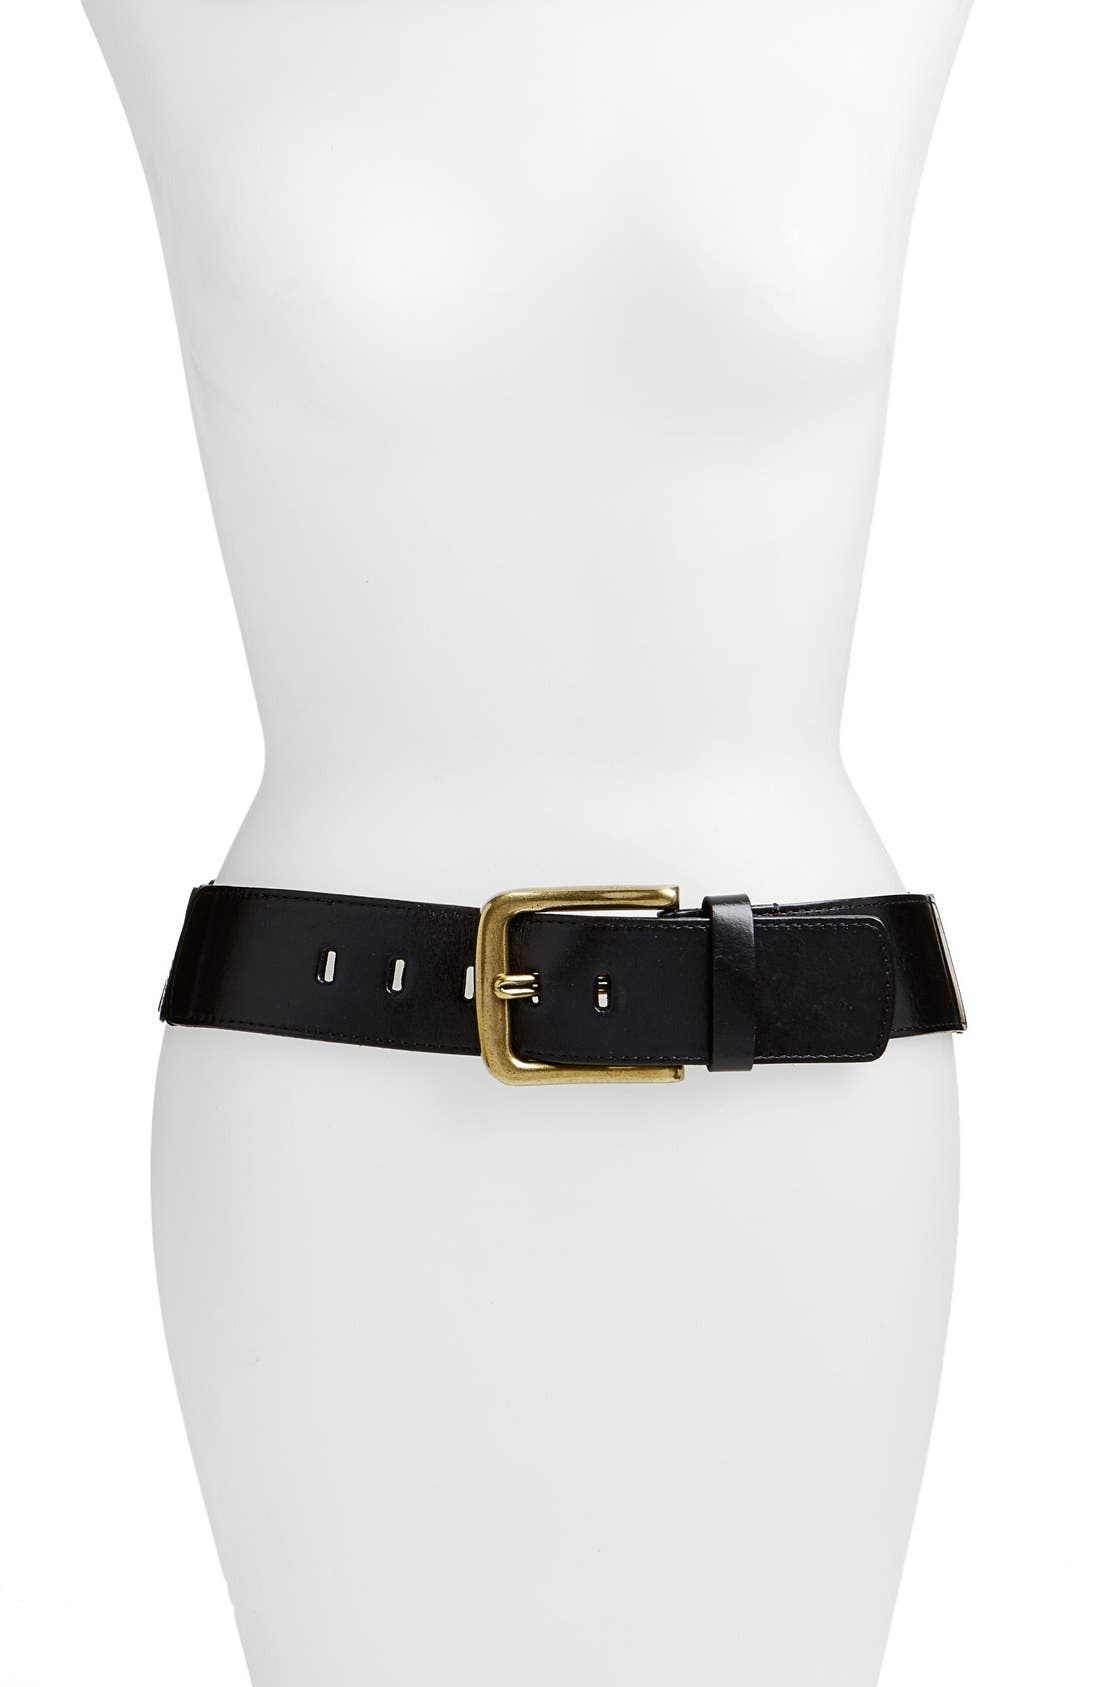 Elise M. 'Sheila' Leather Belt